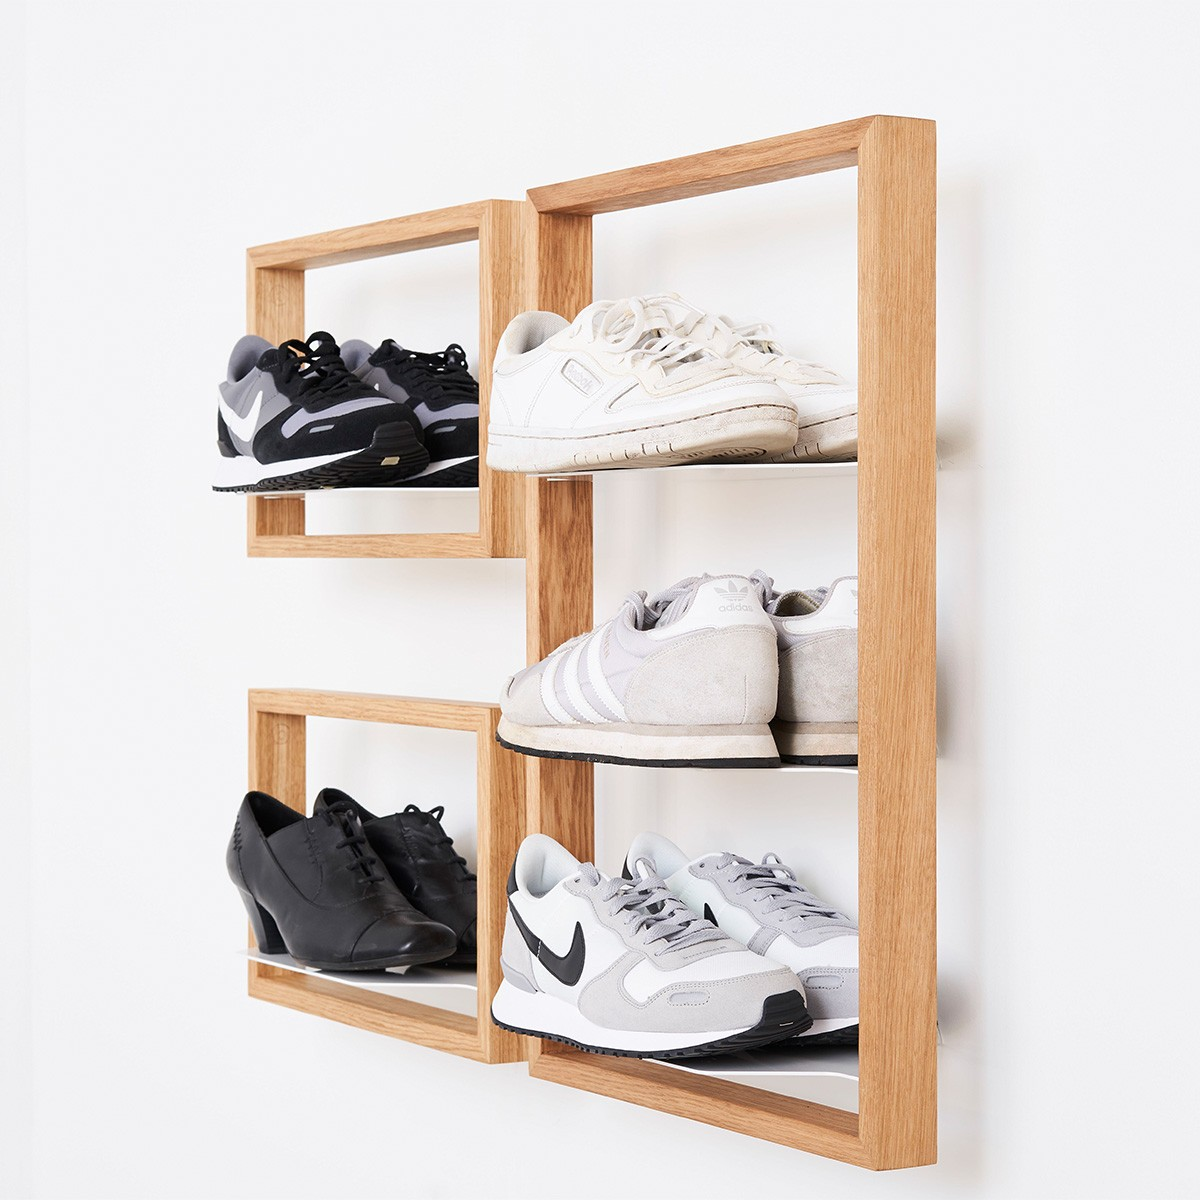 das kleine b schuhregal basti. Black Bedroom Furniture Sets. Home Design Ideas